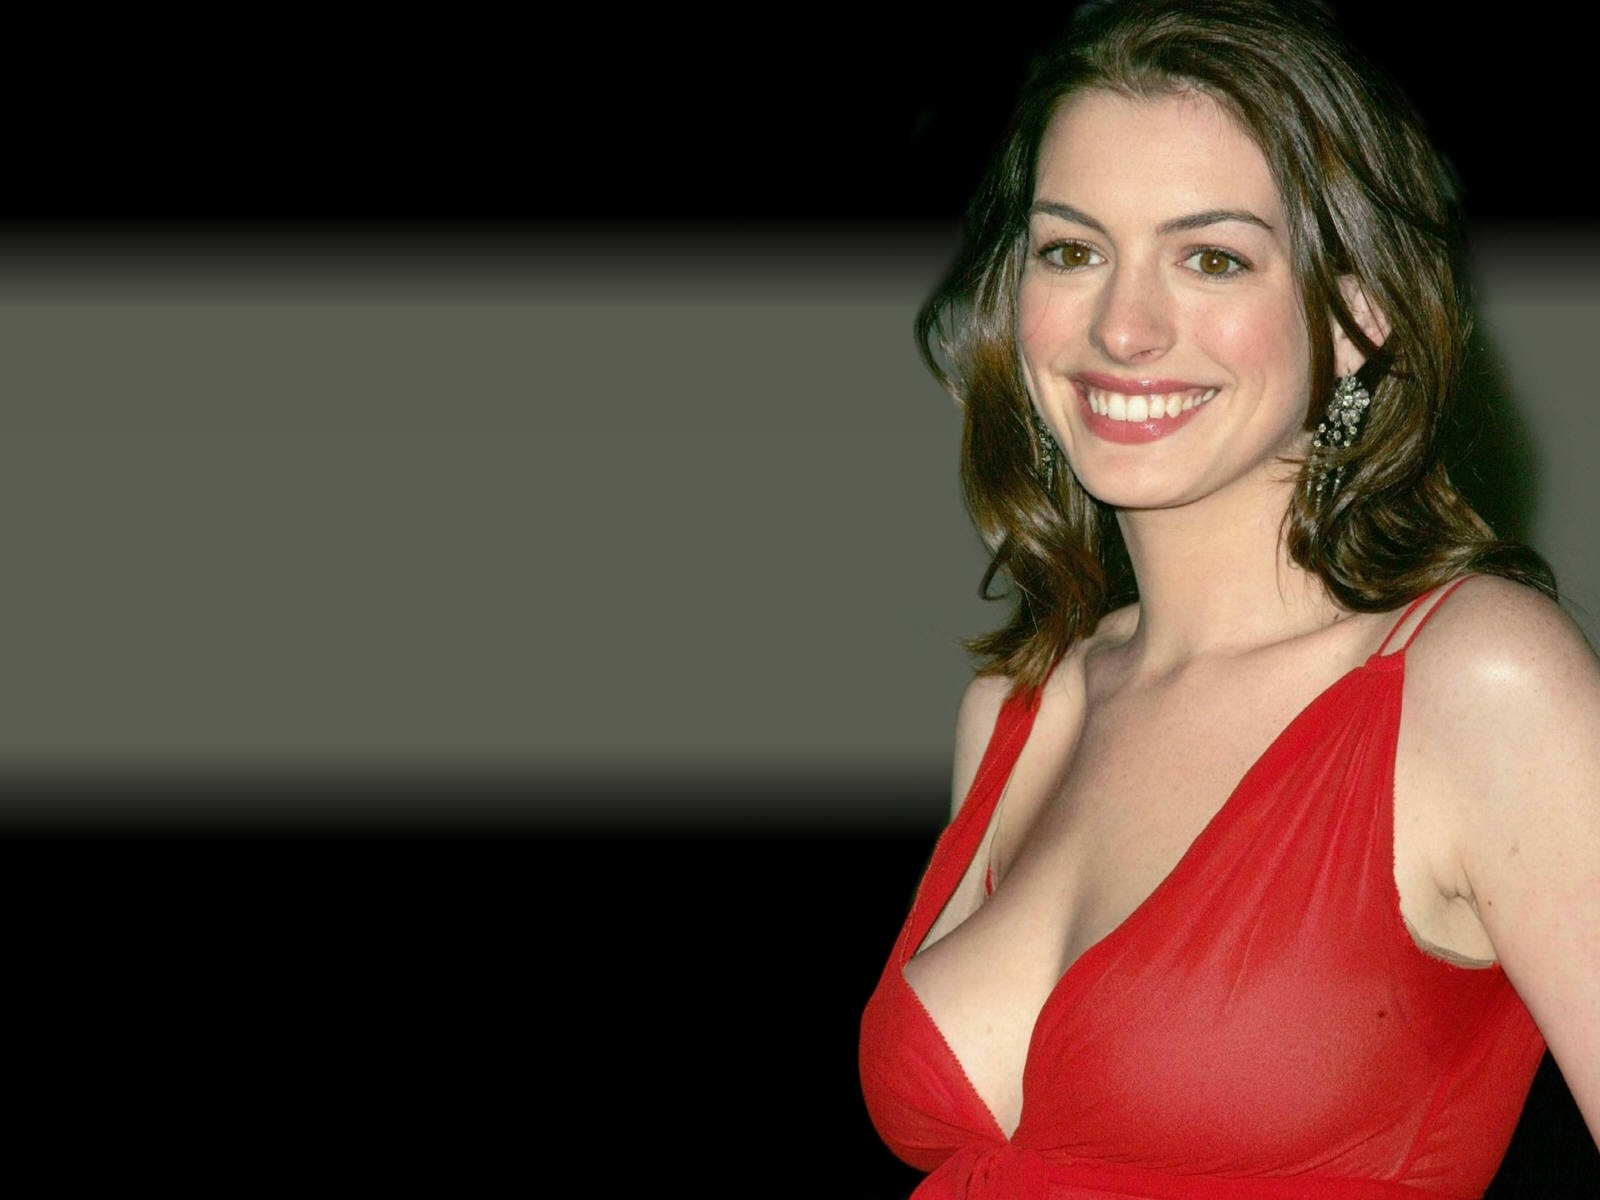 Wallpaper di Anne Hathaway - 5